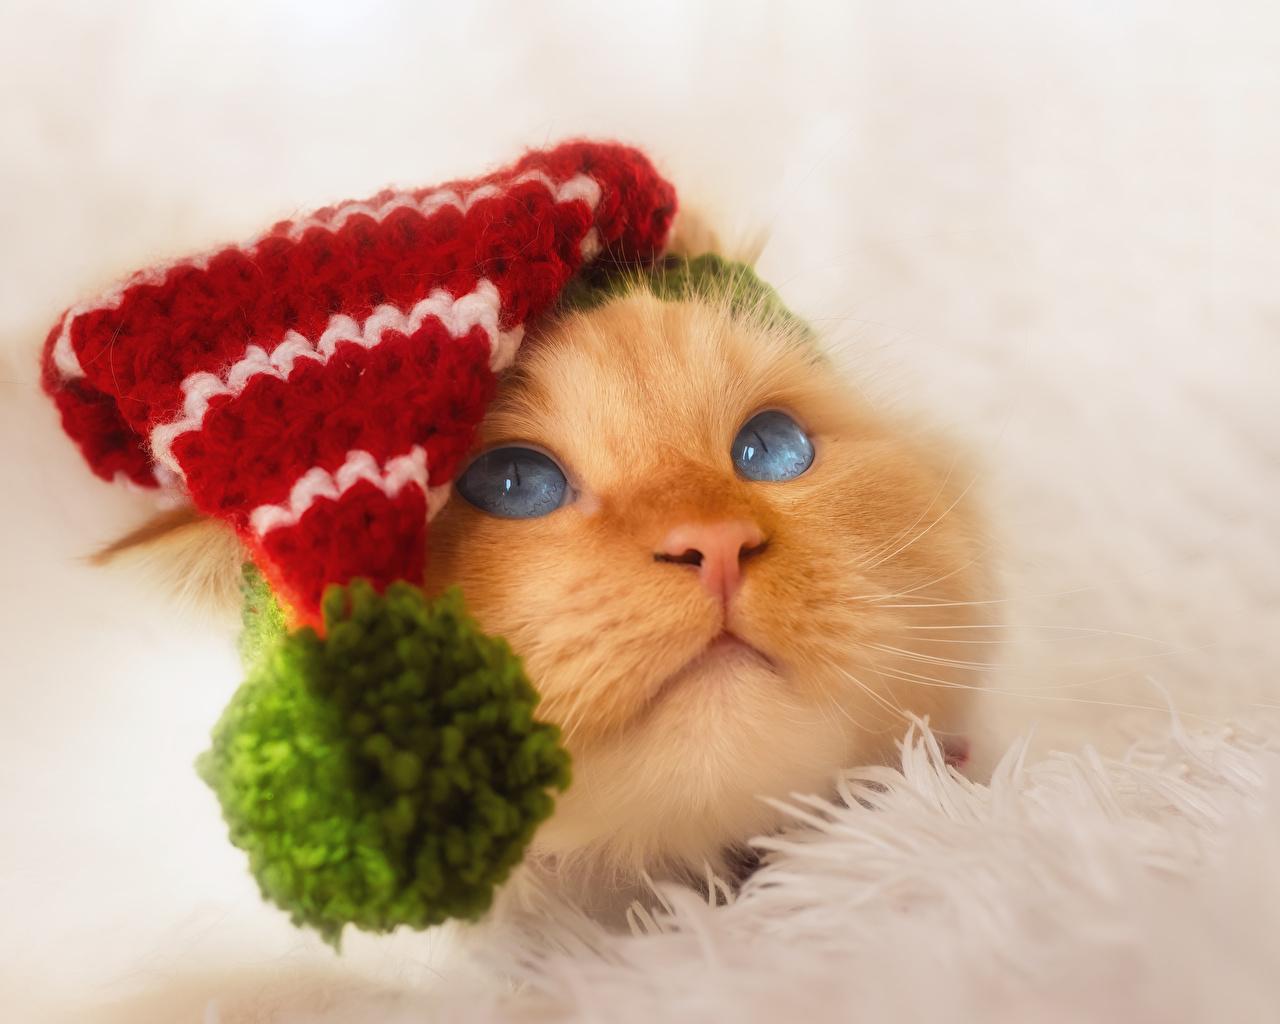 Fotos von Katze Mütze Schnauze Tiere Starren Katzen Hauskatze Blick ein Tier